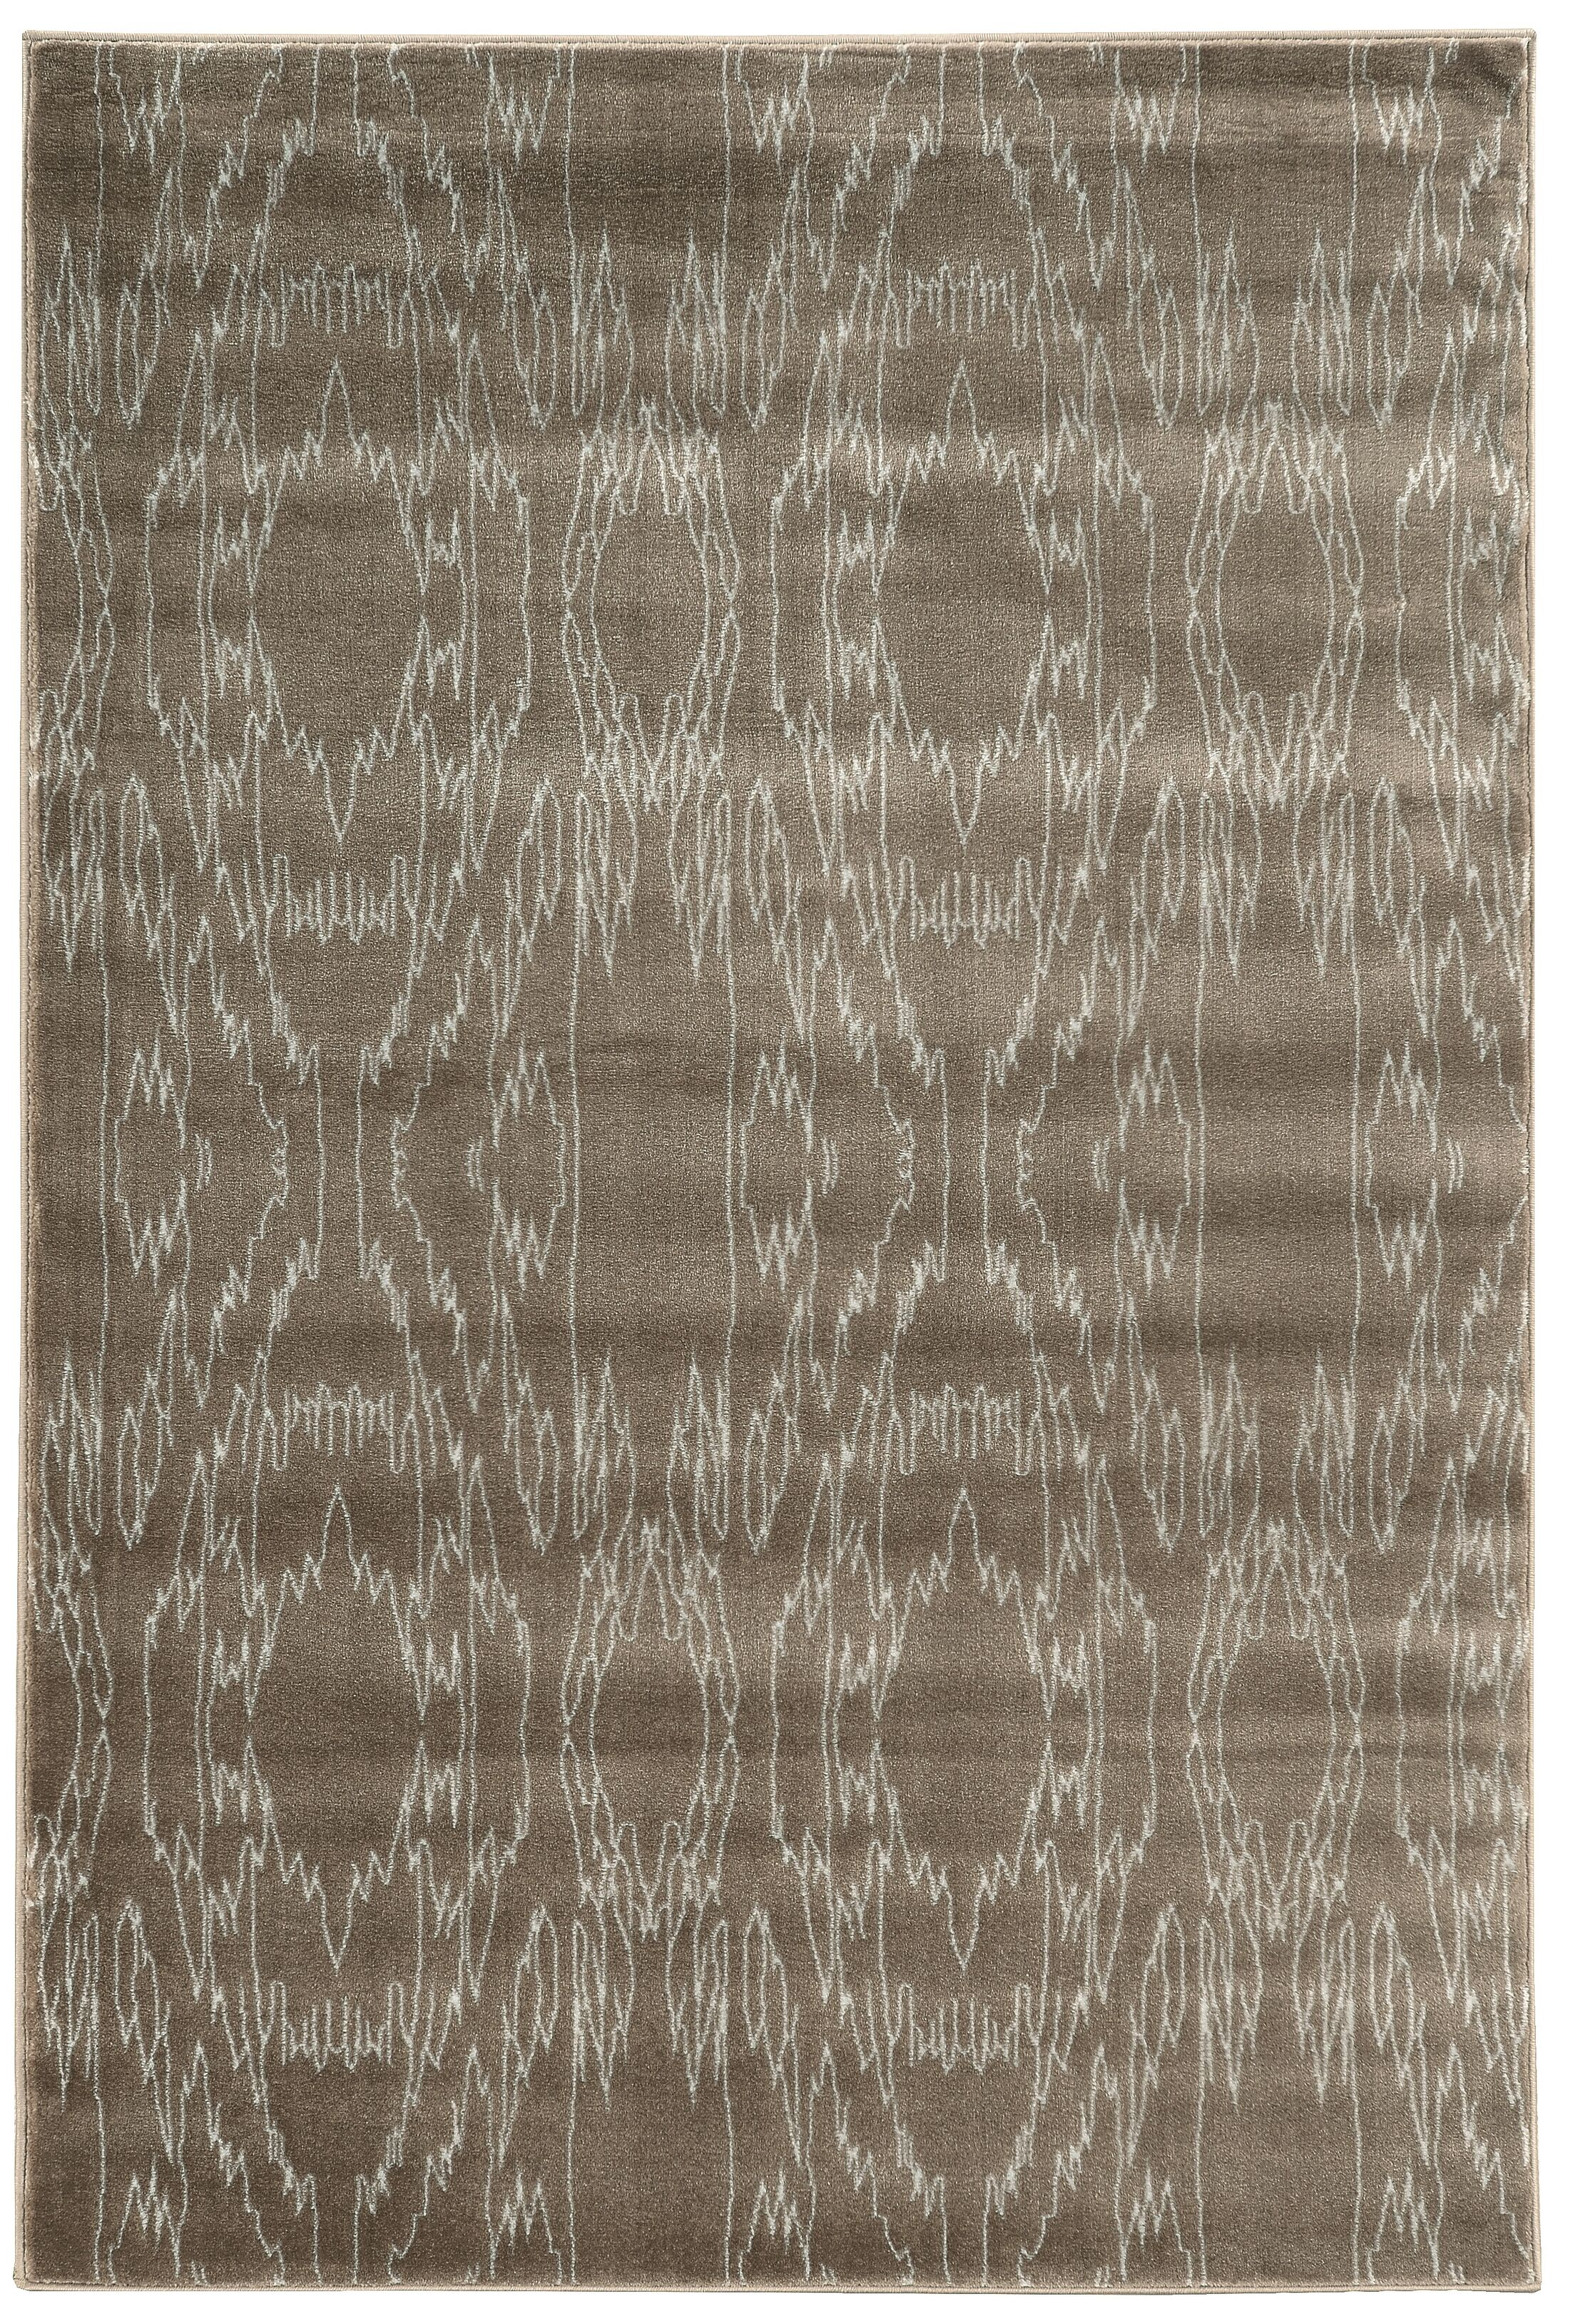 Lucinda Dark Brown Area Rug Rug Size: Rectangle 8' x 10'